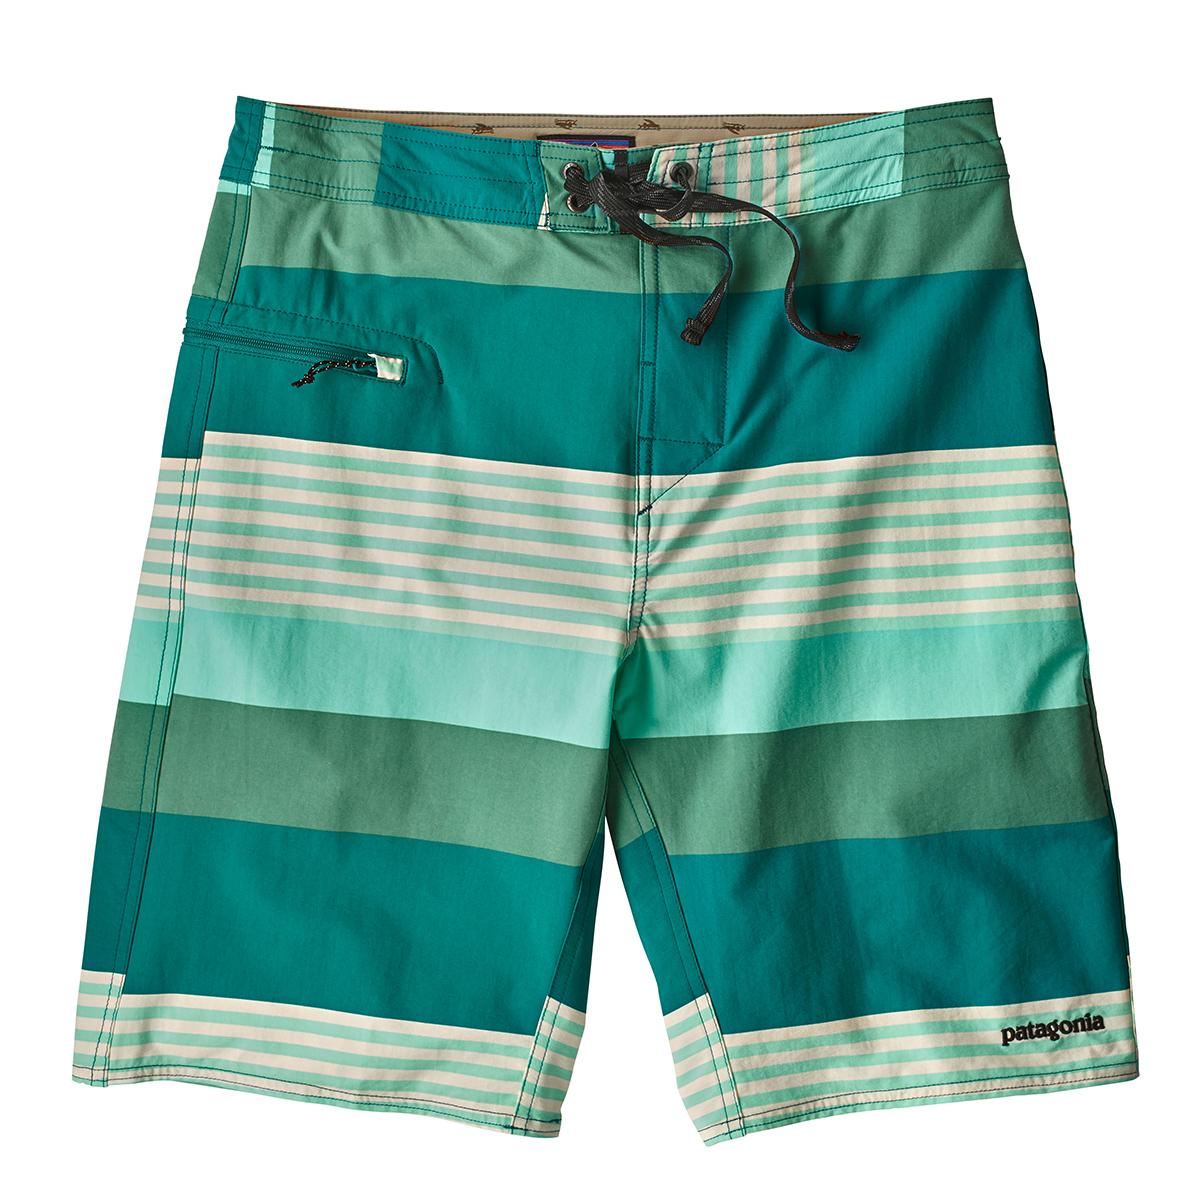 1330068c3a6 Patagonia Men s Stretch Wavefarer Boardshorts - 21